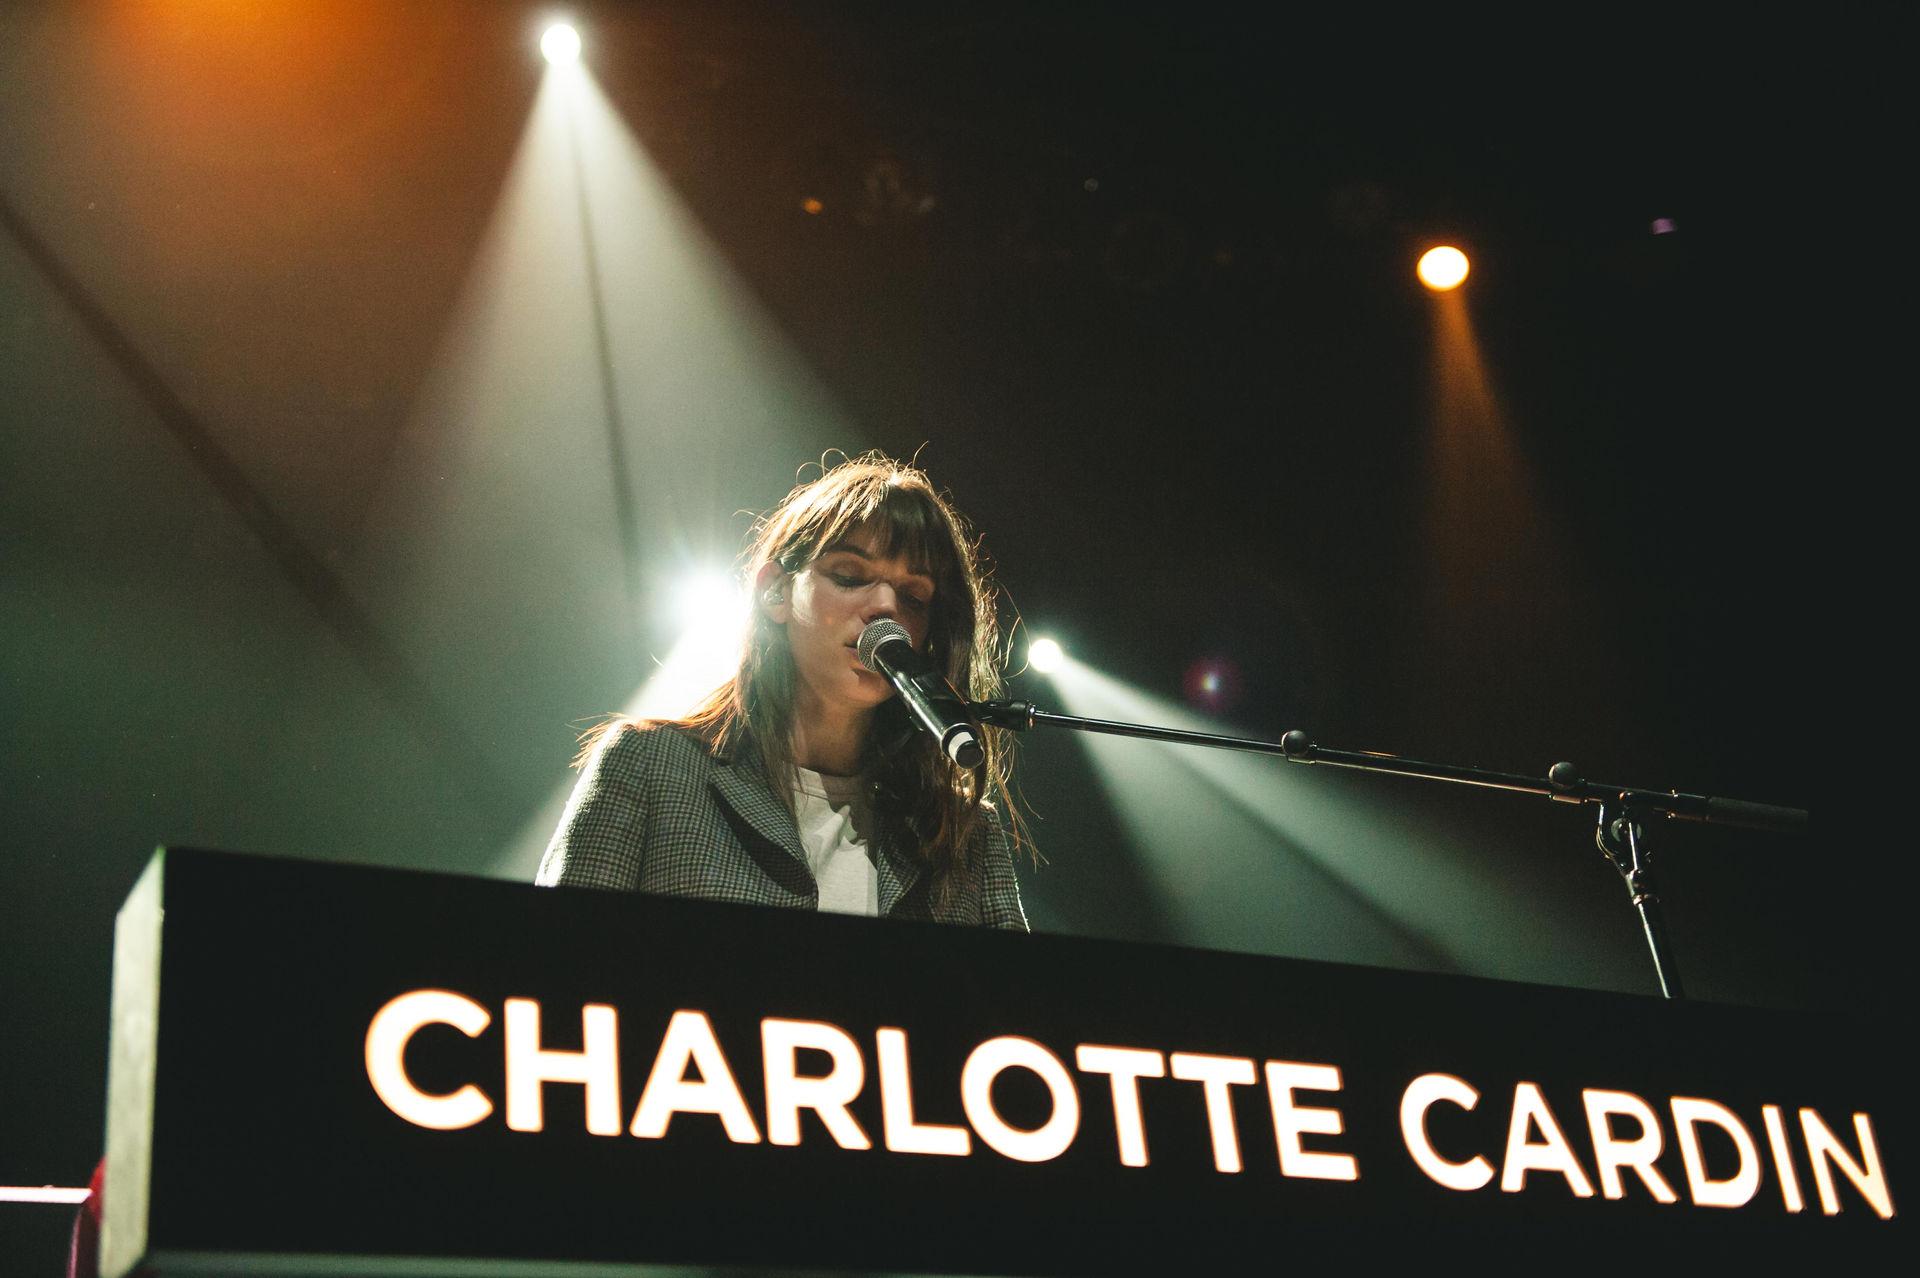 CharlotteCardin-4.jpg